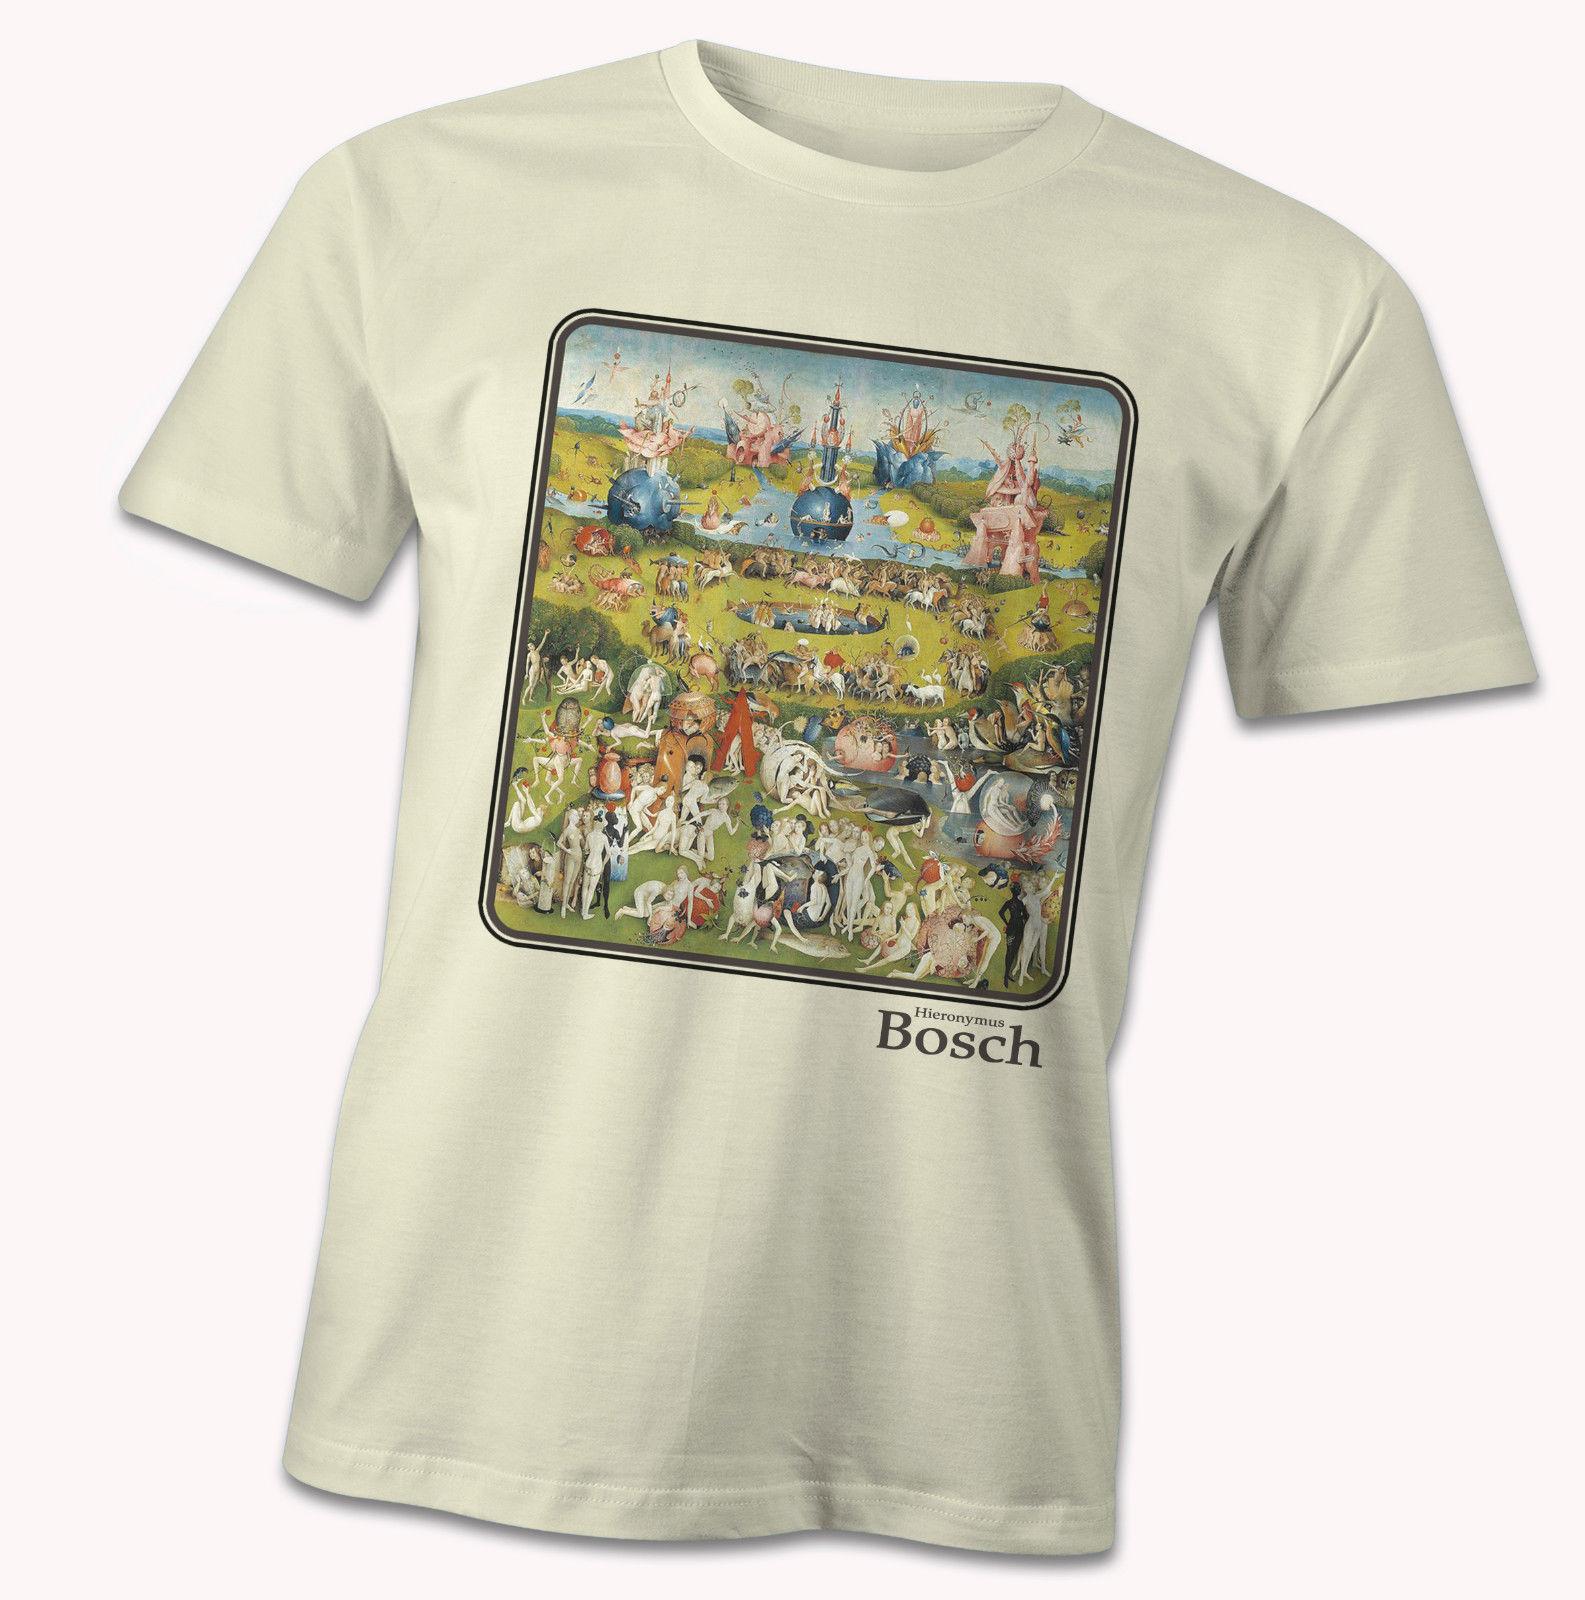 Hieronymus Bosch T-Shirt, The Garden Of Earthly Delights, Dutch Surreal Artist  Cartoon T Shirt Men Unisex New Fashion Tshirt